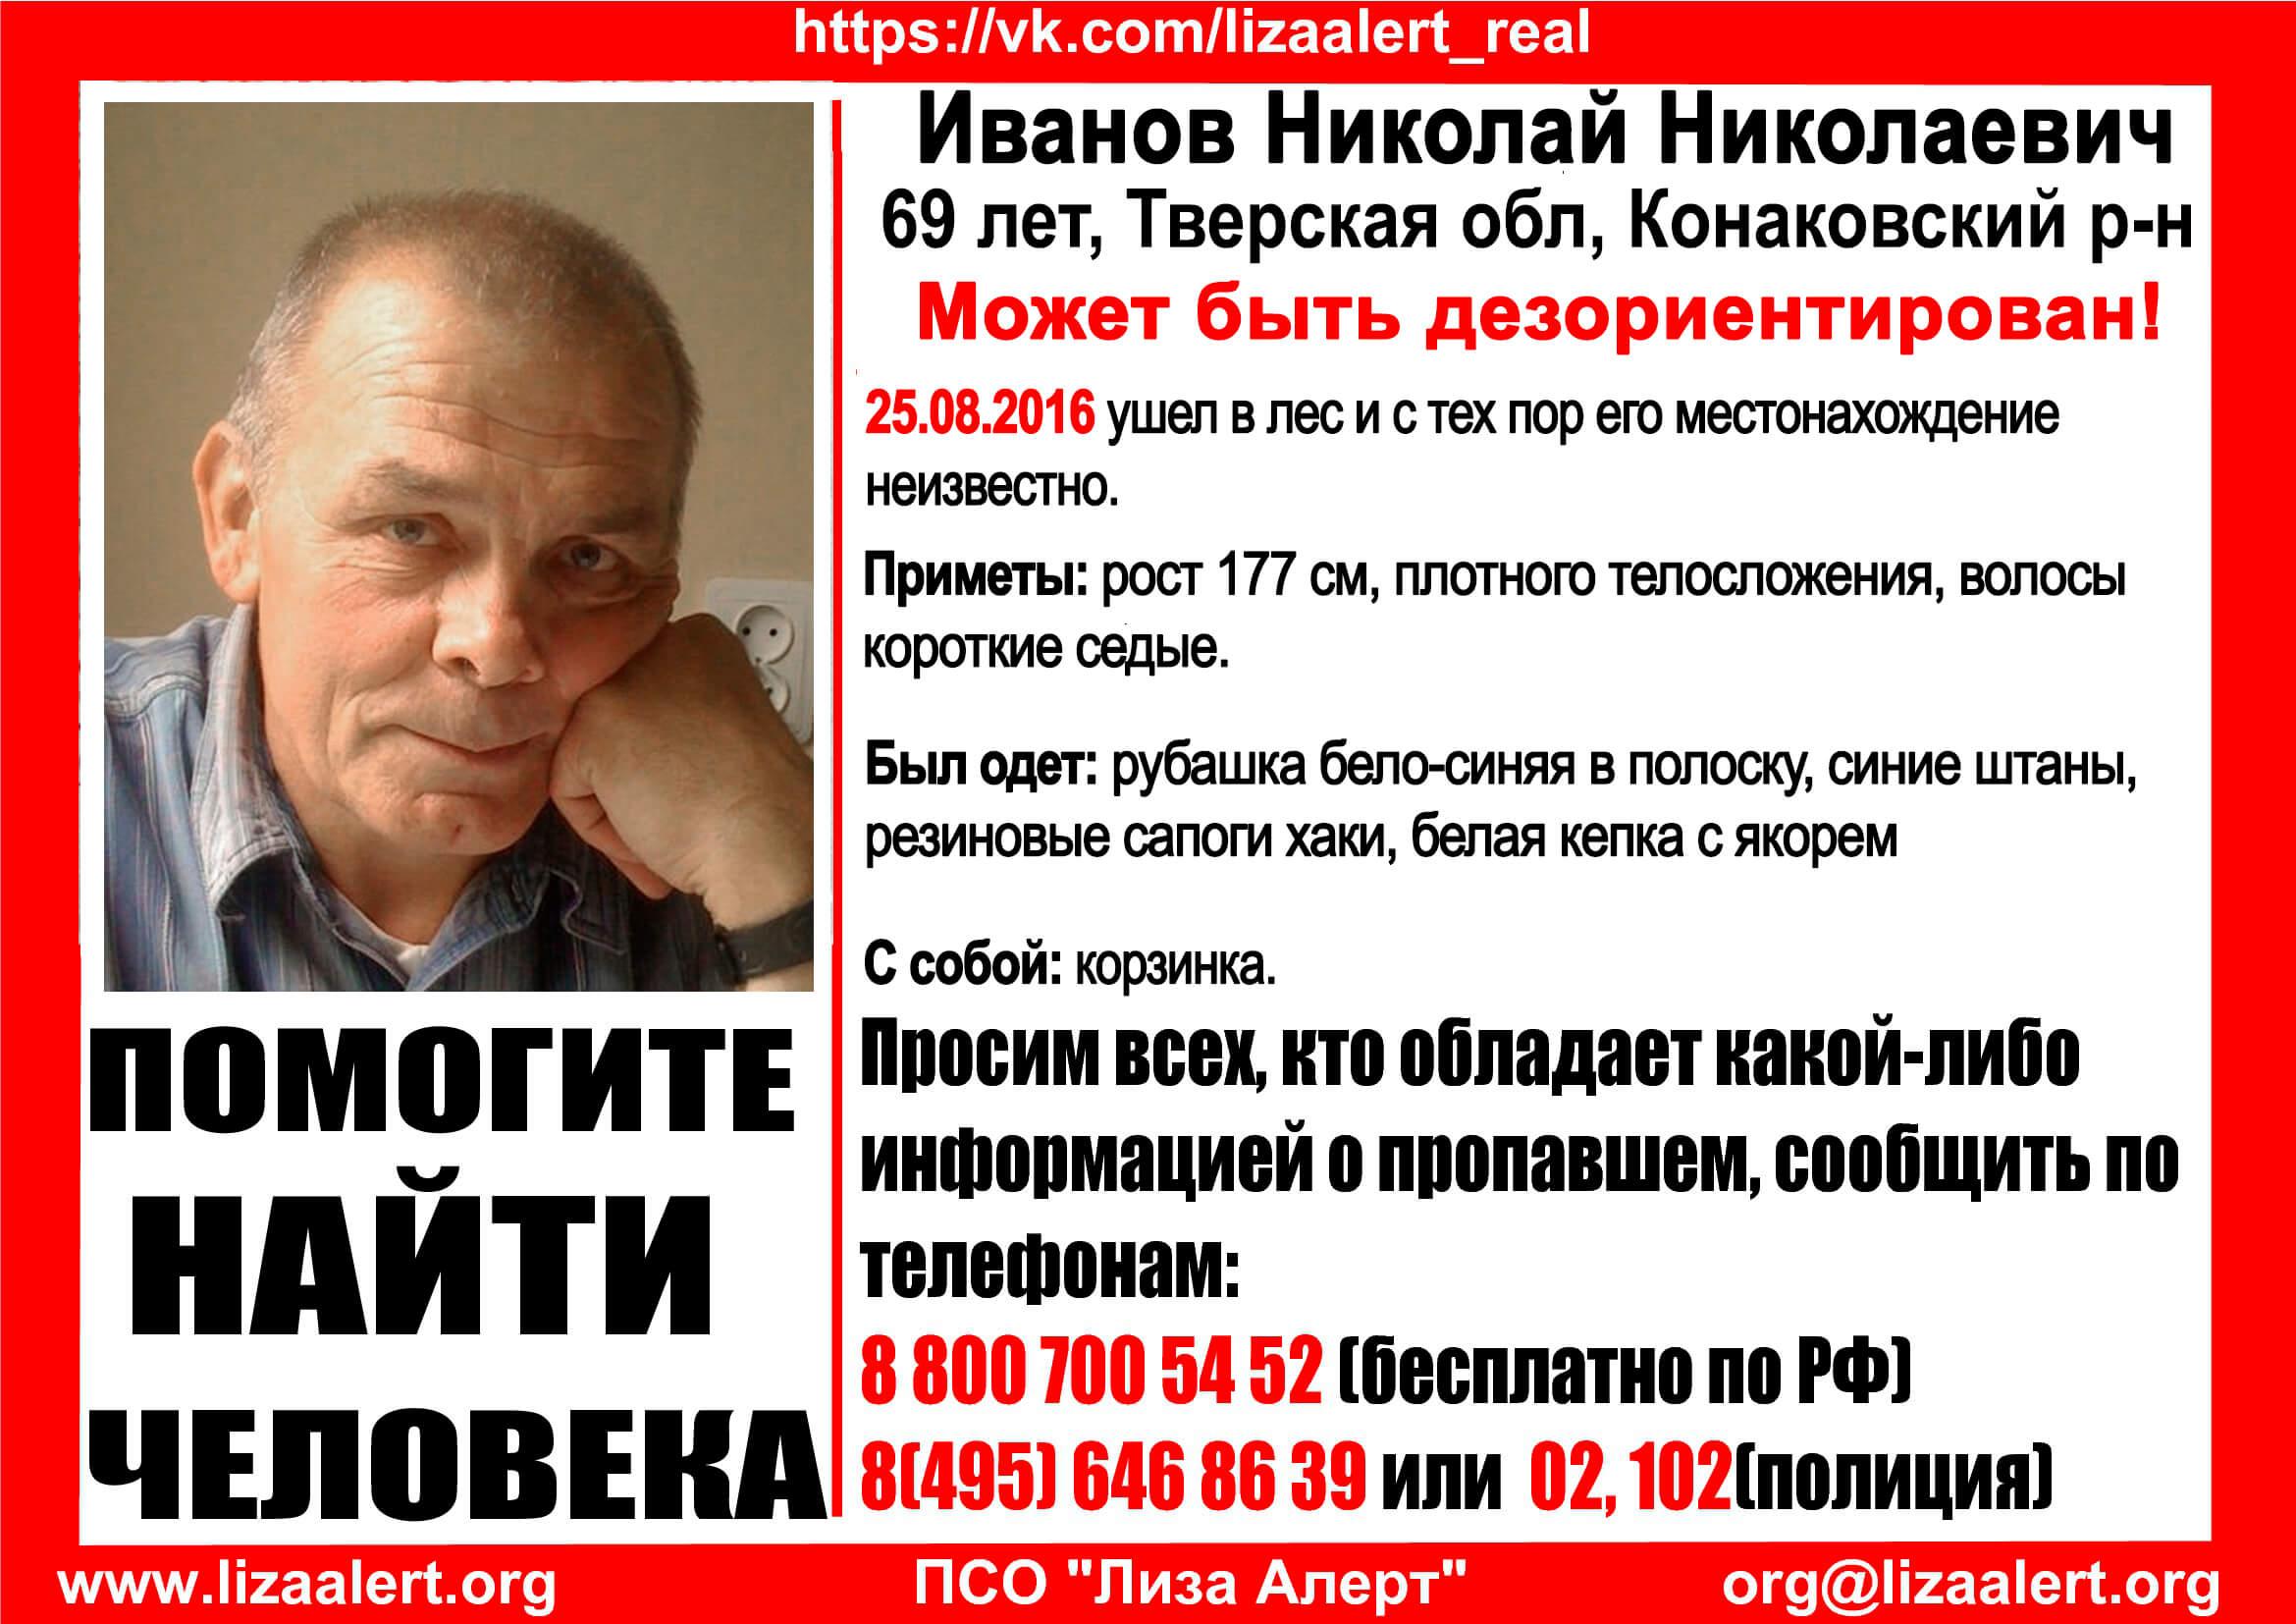 (Найден, погиб) В Конаковском районе пропал Николай Иванов